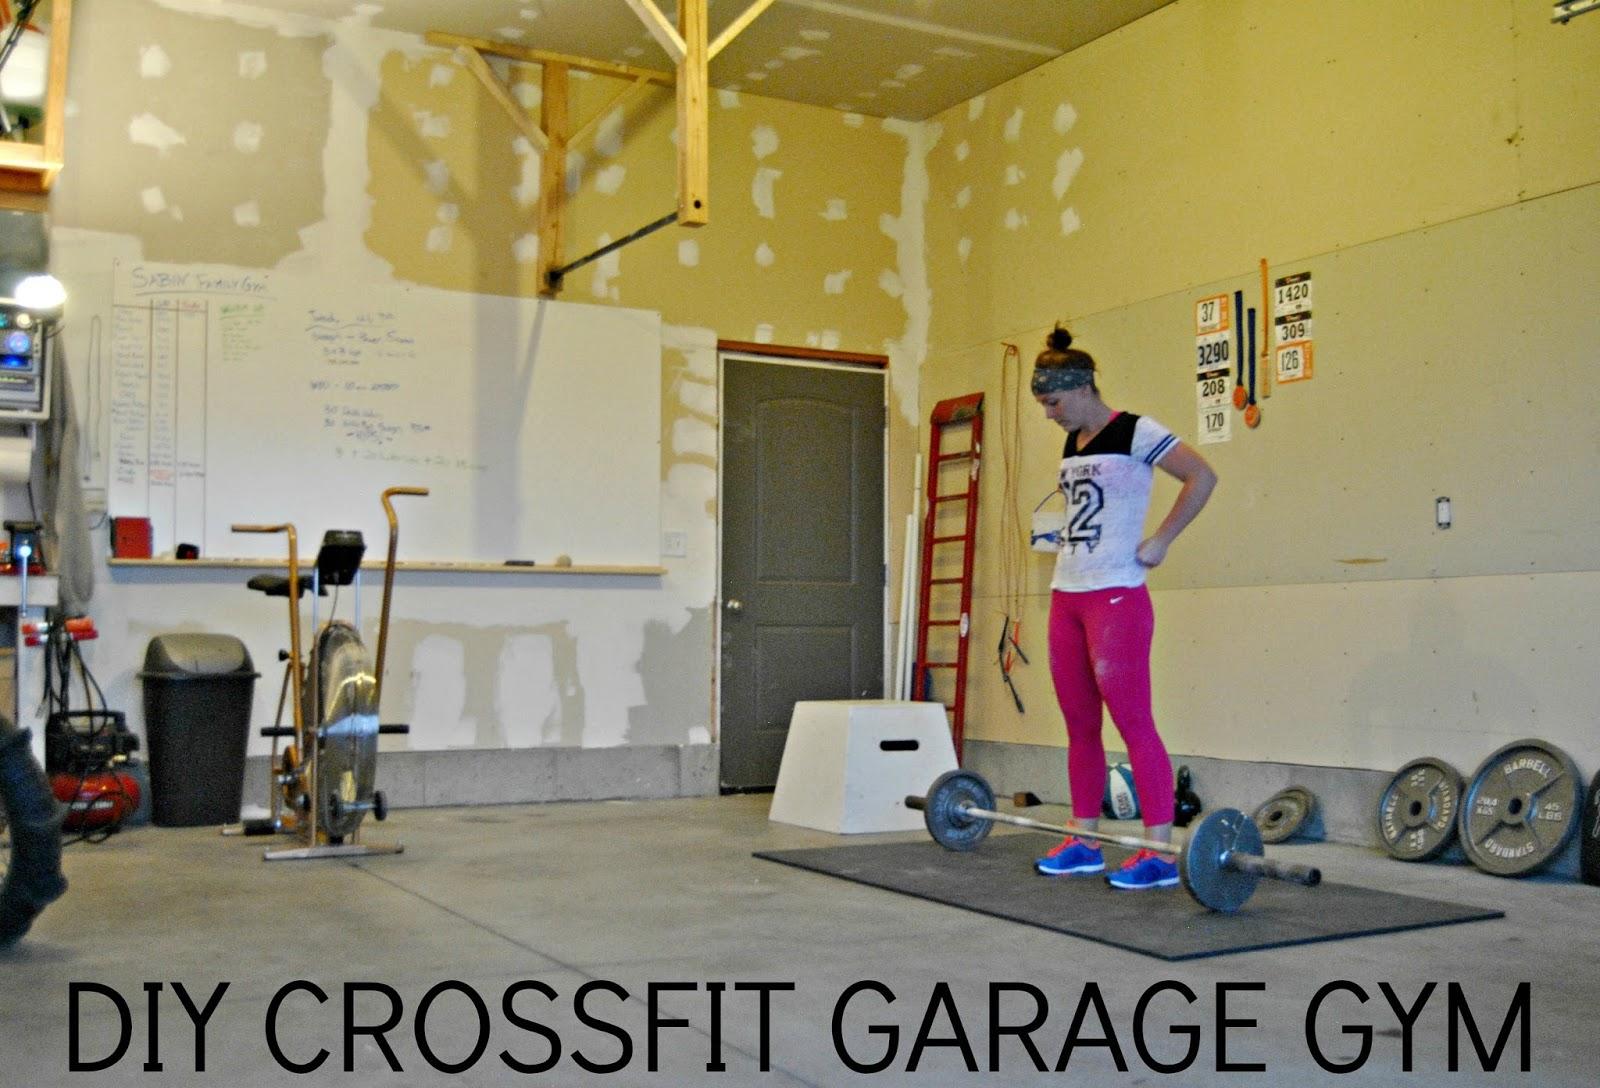 DIY CROSSFIT GARAGE GYM: part 1